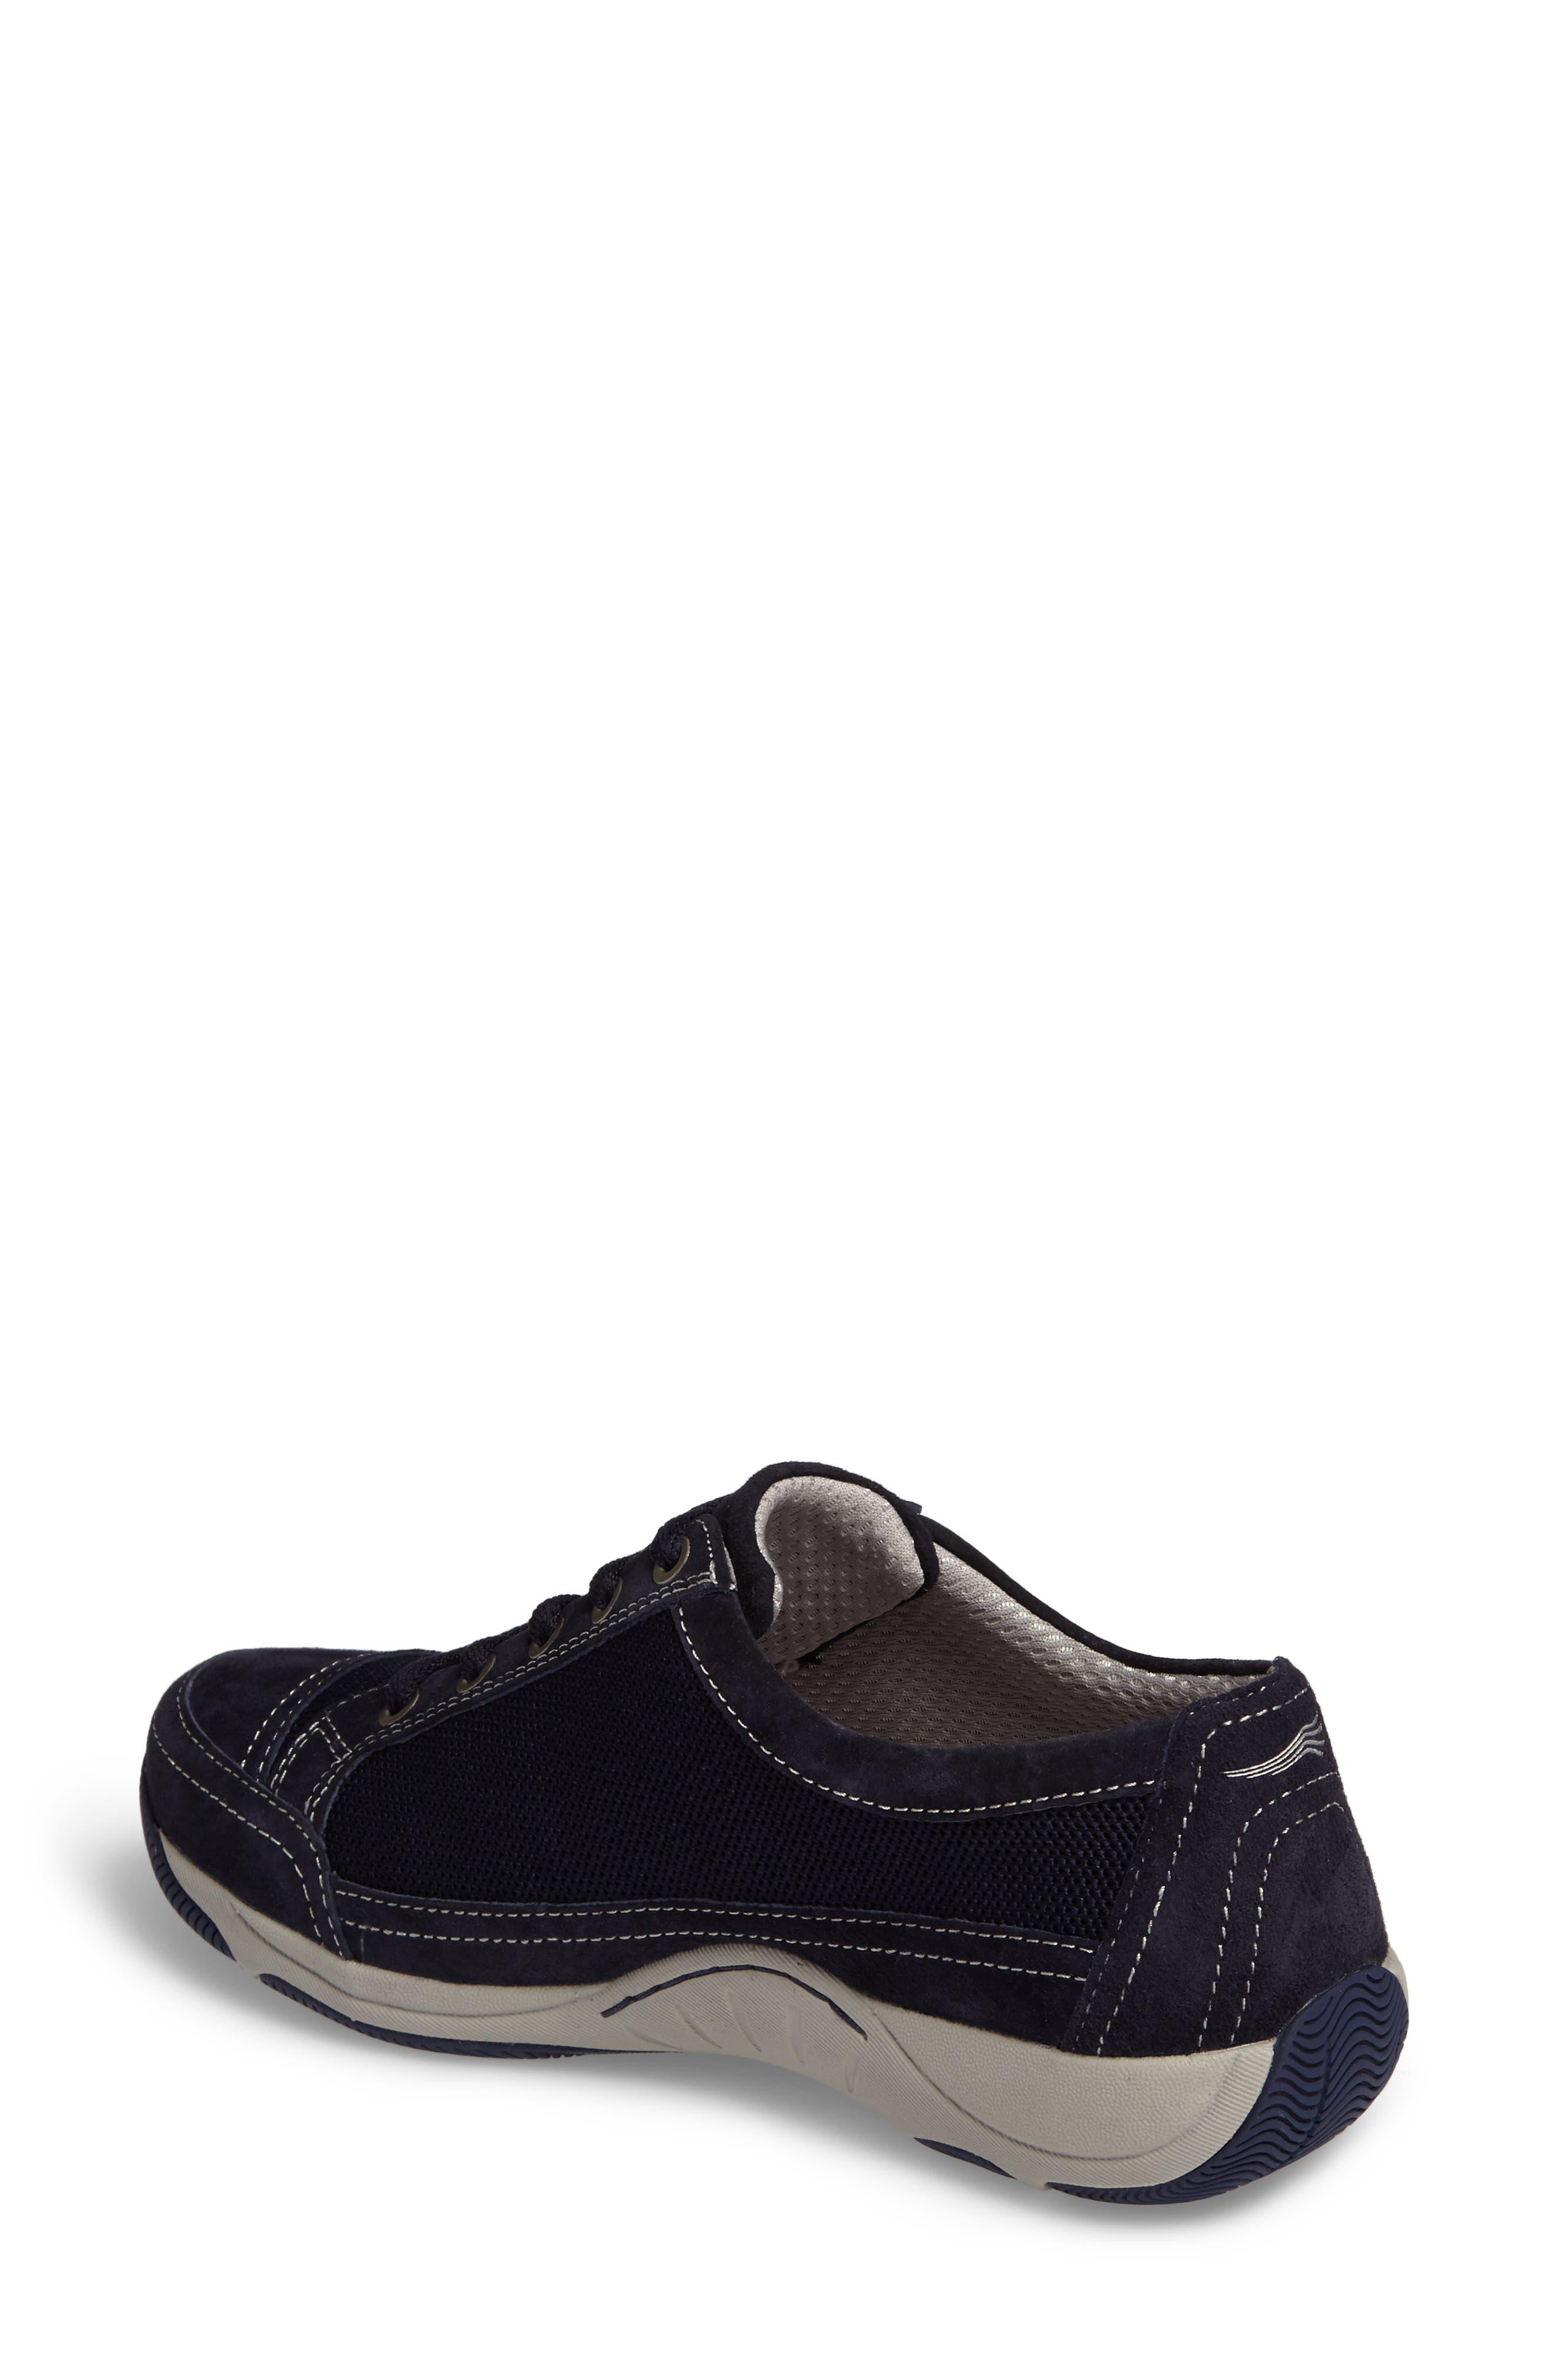 Harmony Sneaker,                             Alternate thumbnail 6, color,